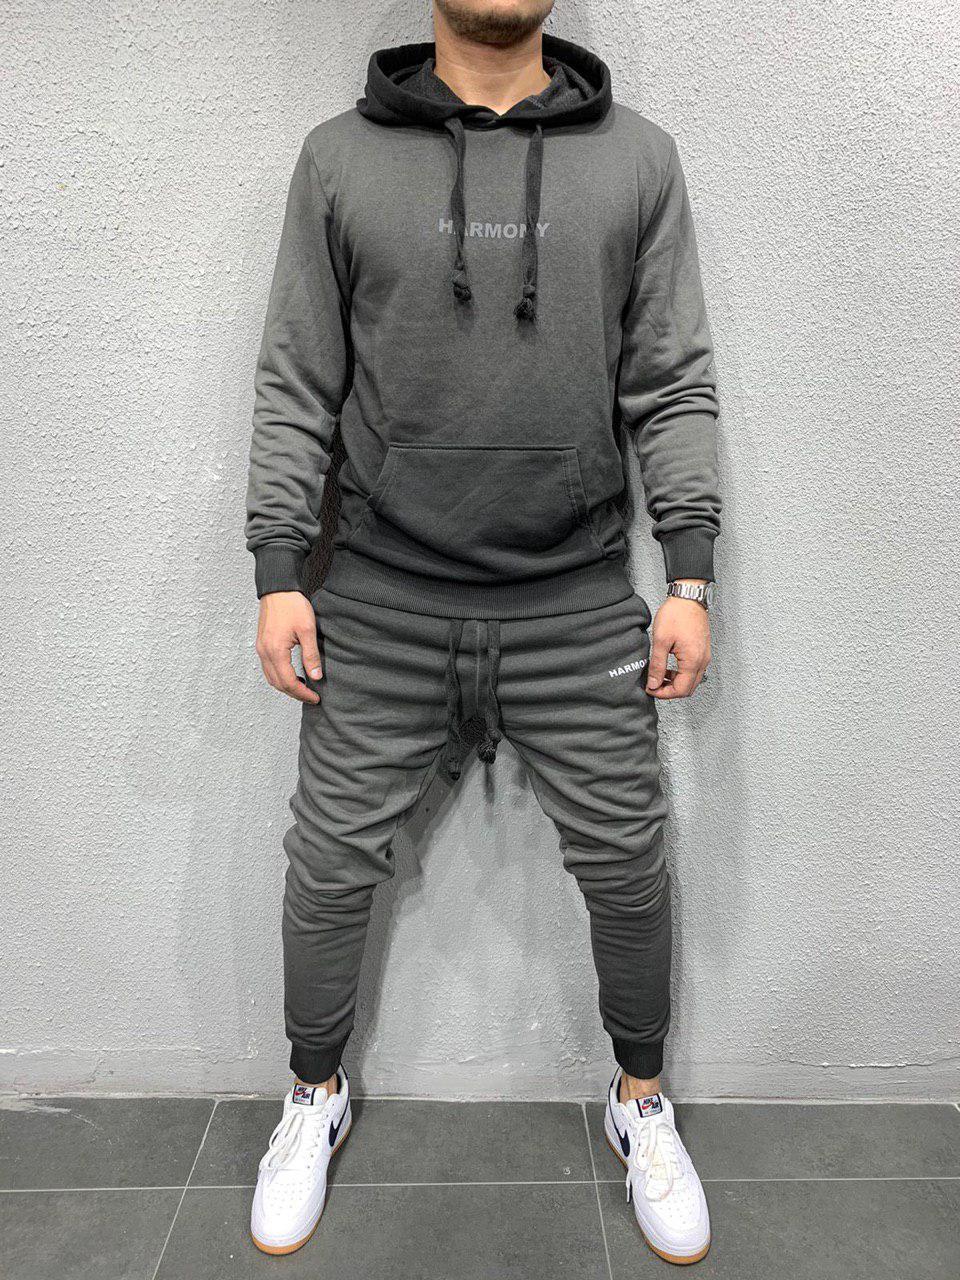 Мужской спортивный костюм стильный хайповый молодёжный серый  кенгуру+штаны